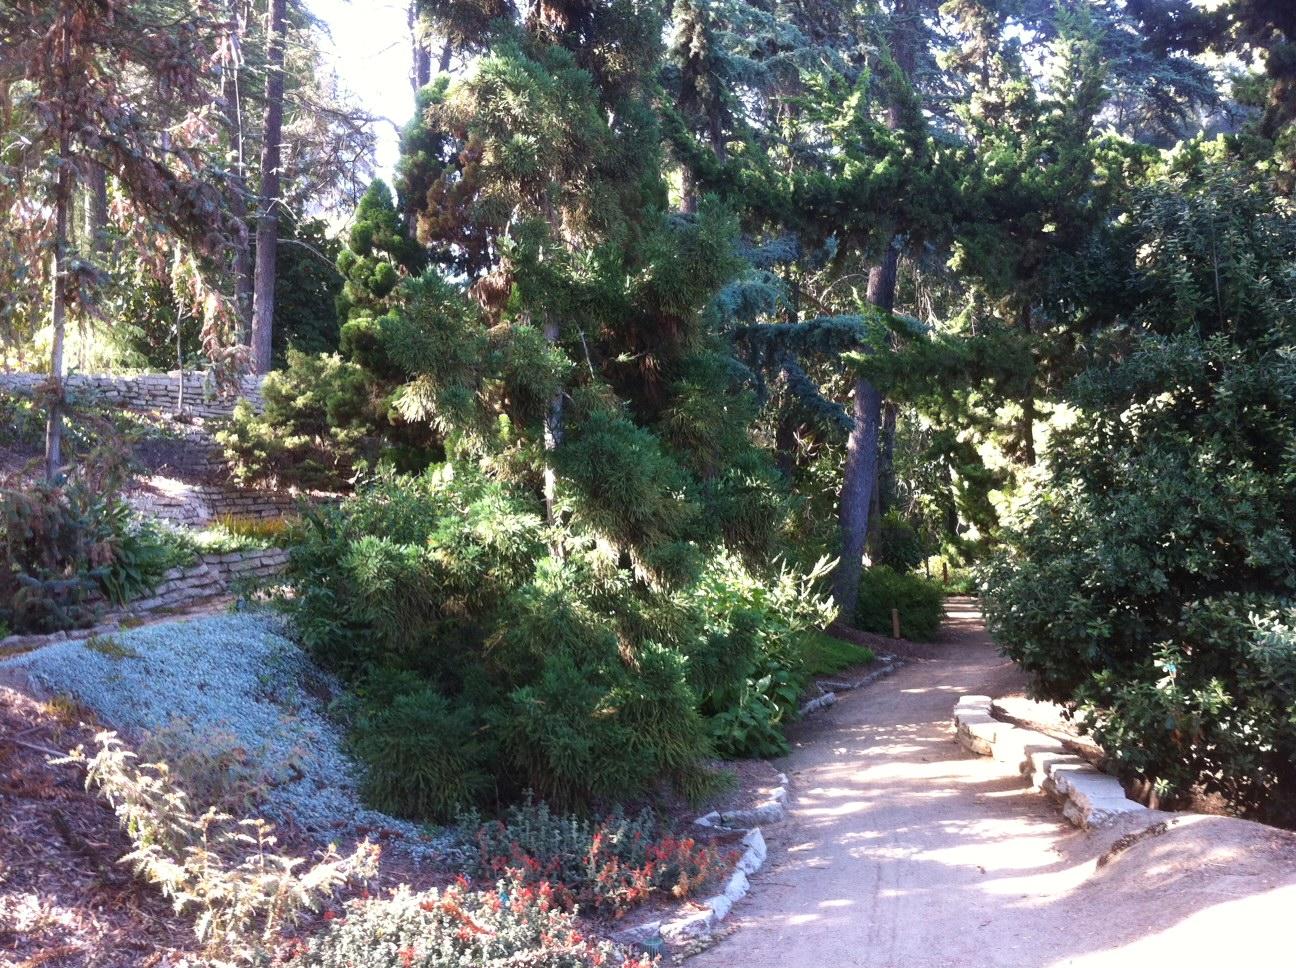 File:Mildred E. Matthias Botanical Gardens 04.JPG